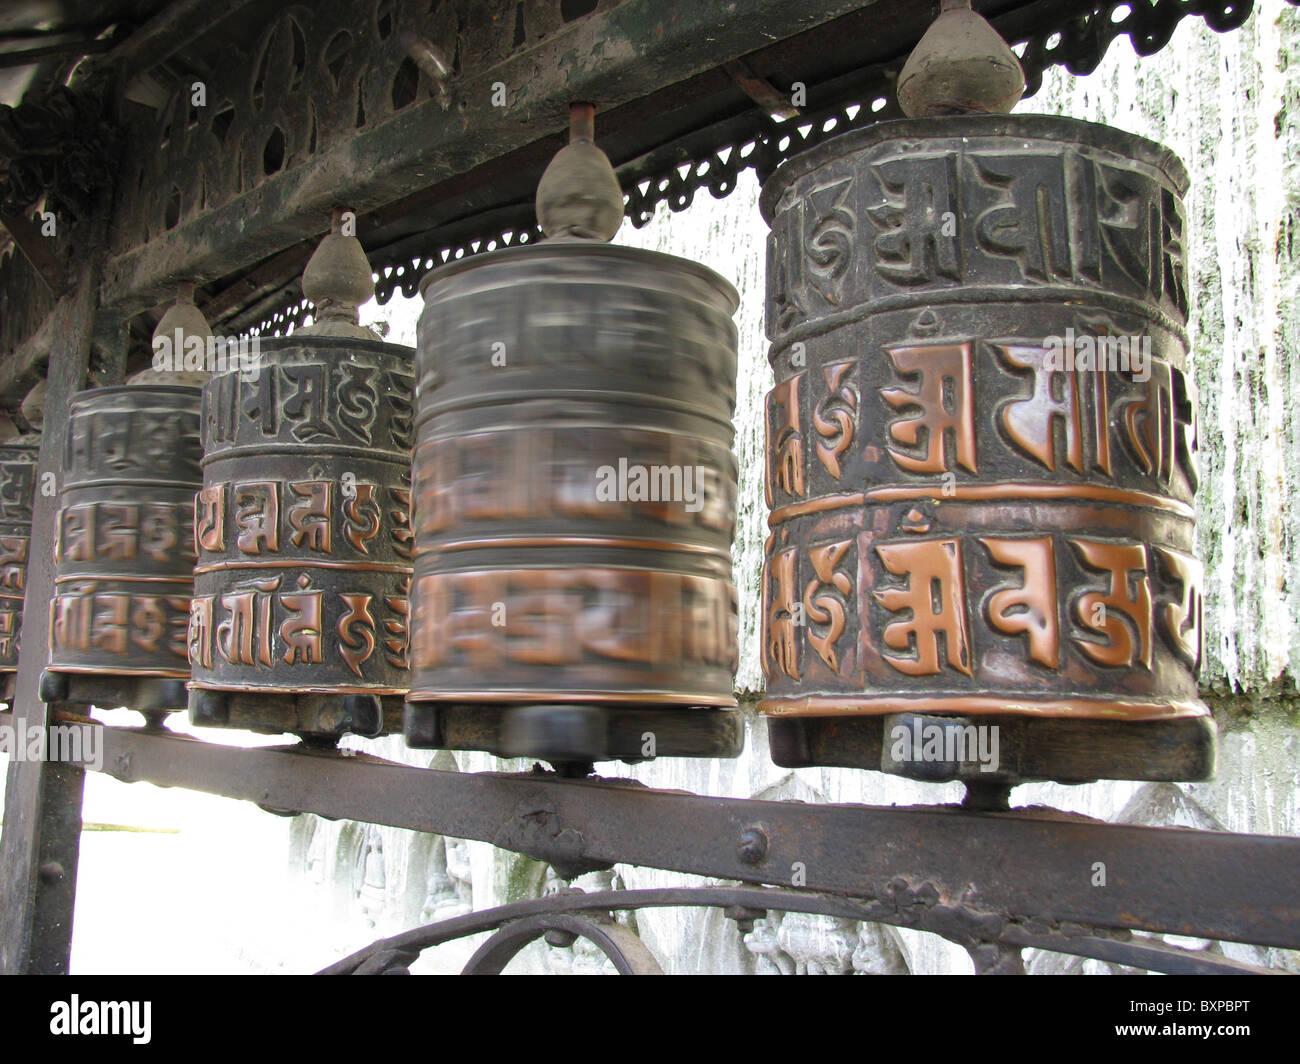 Buddhist prayer wheels in Bodnath stupa in Kathmandu, Nepal - Stock Image